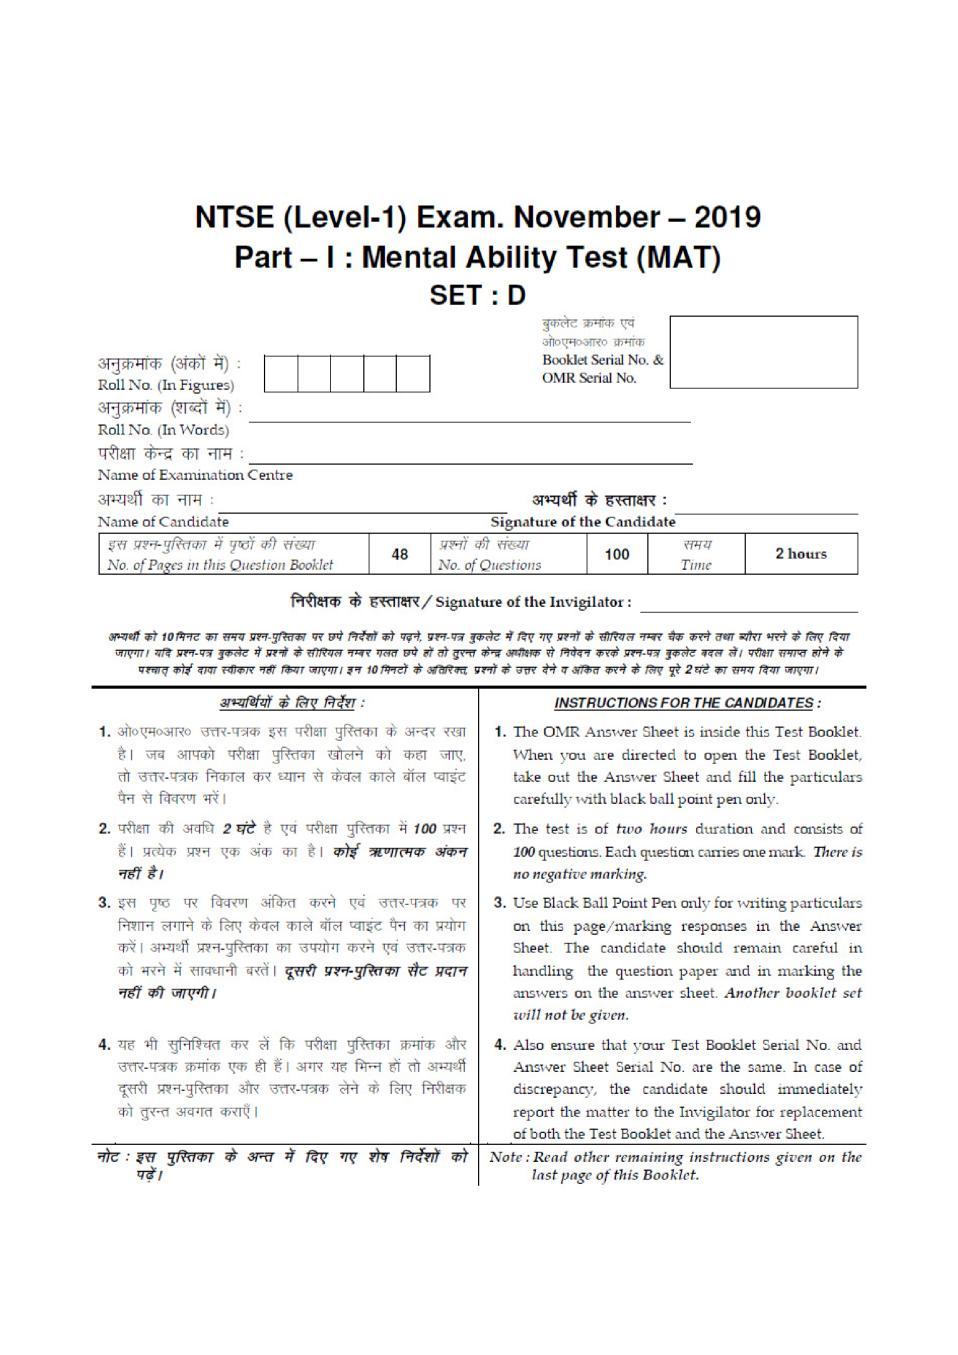 Haryana NTSE Nov 2019 MAT Question Paper Set D - Page 1